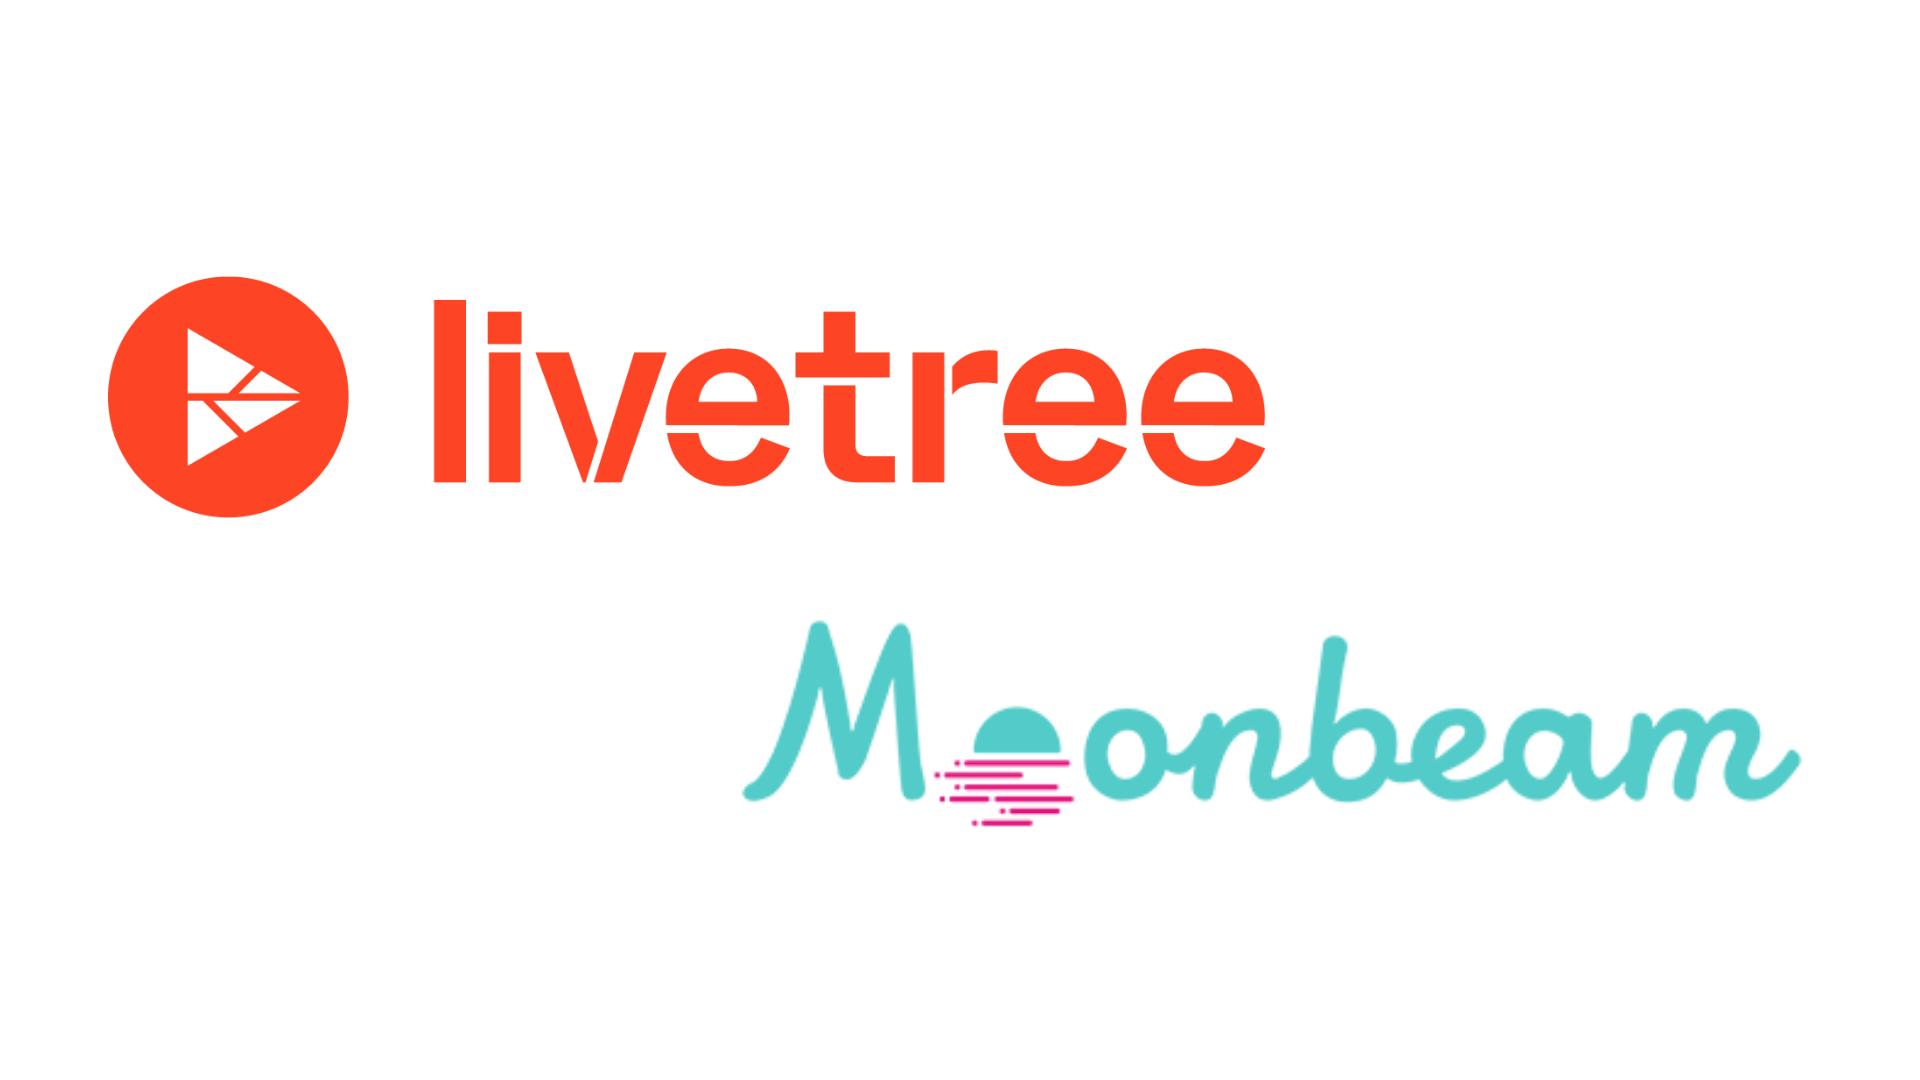 livetree and moonbeam partnership